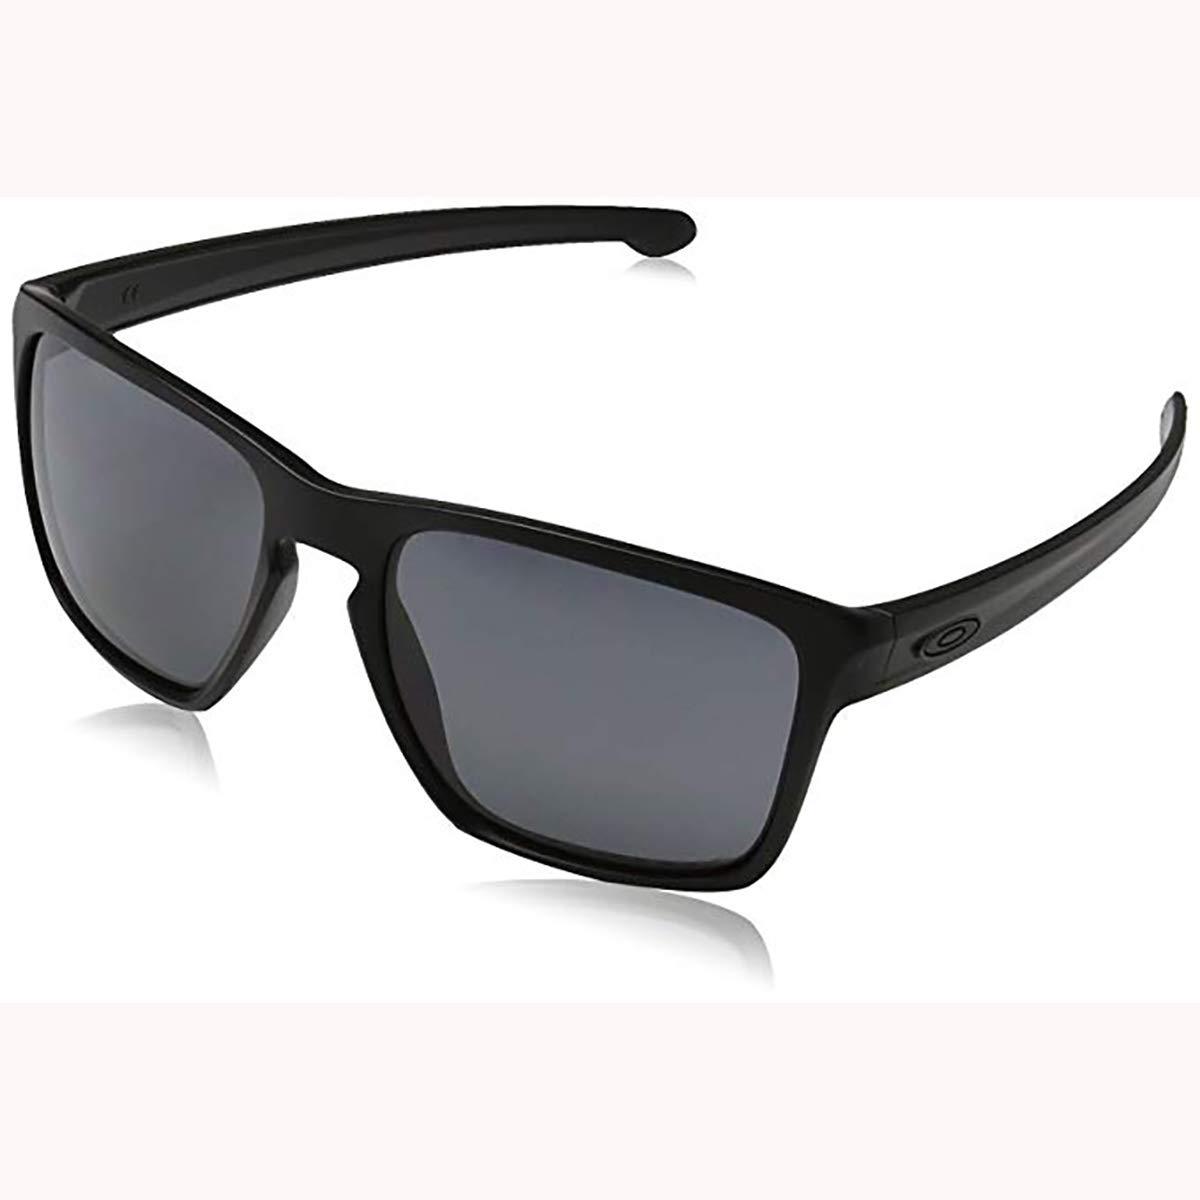 Oakley Men's OO9341 Sliver XL Rectangular Sunglasses, Matte Black/Grey Polarized, 57 mm by Oakley